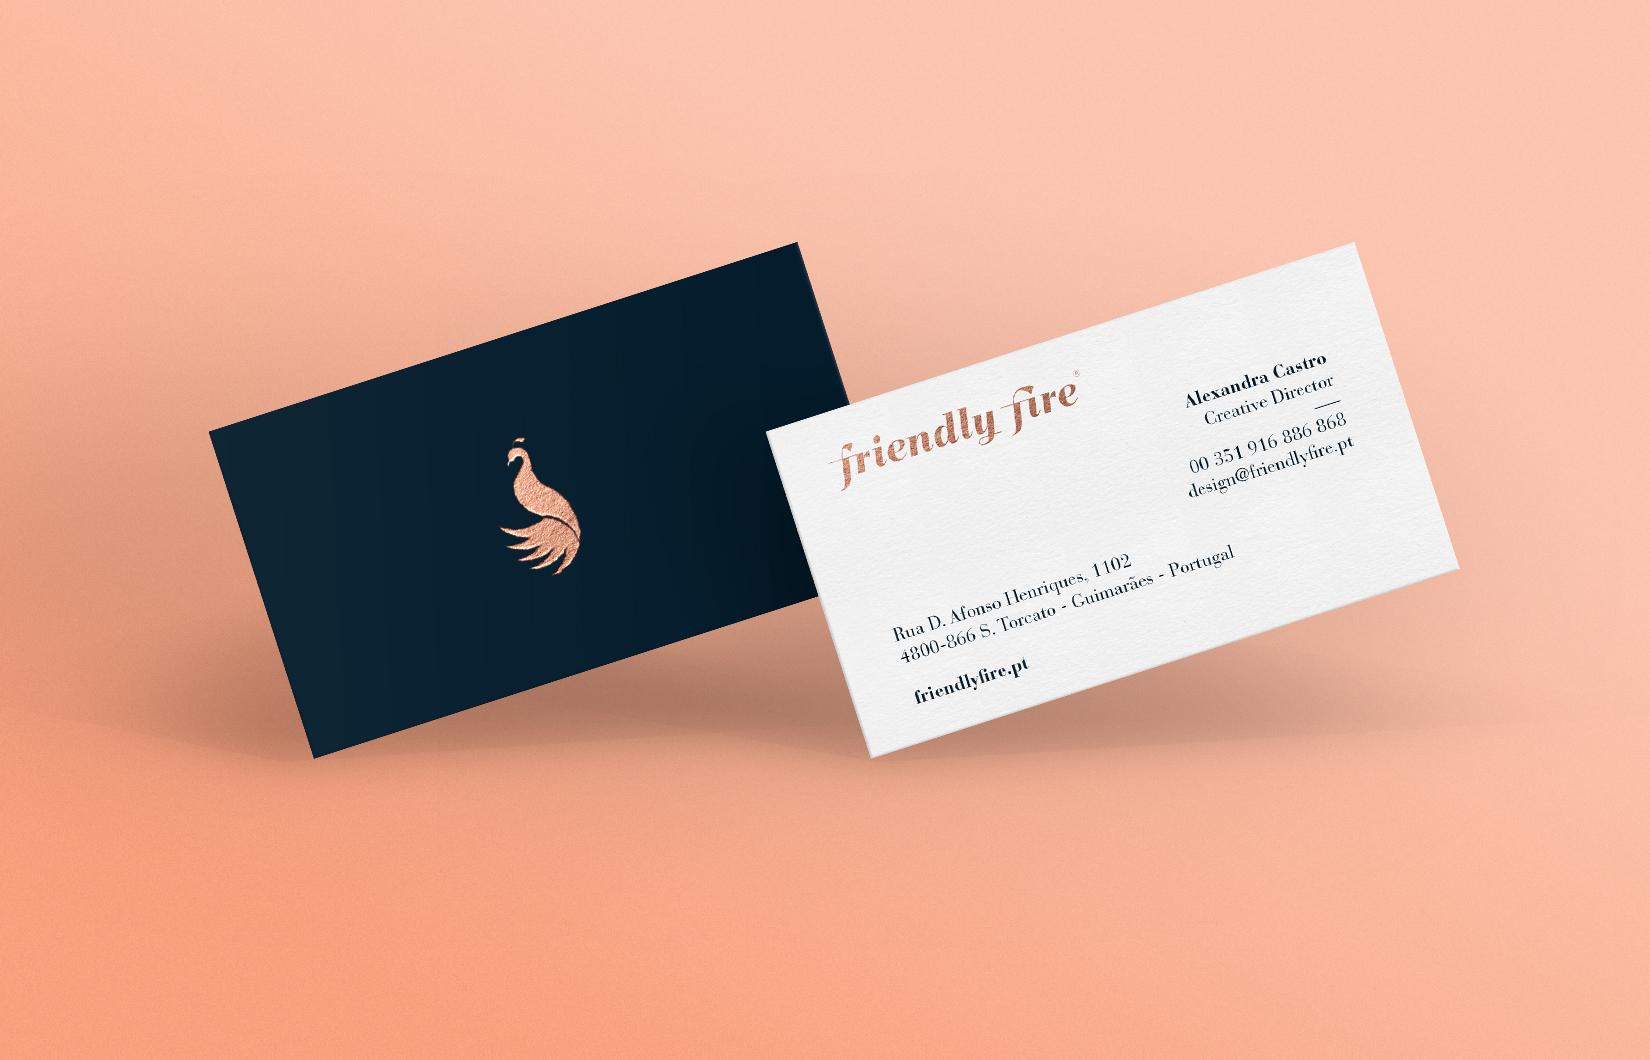 fashion-makers-friendlyfireshoes-business-cards.jpg